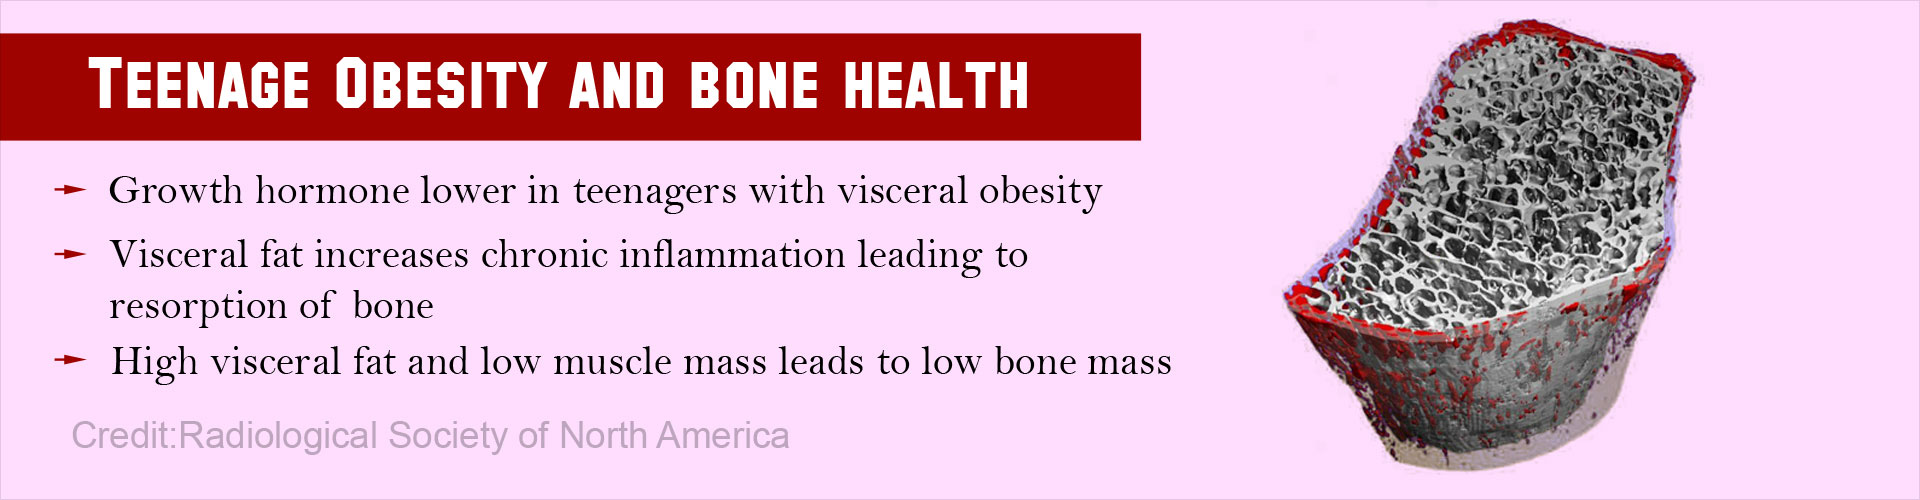 Teenage Obesity Permanently Affects Bone Health